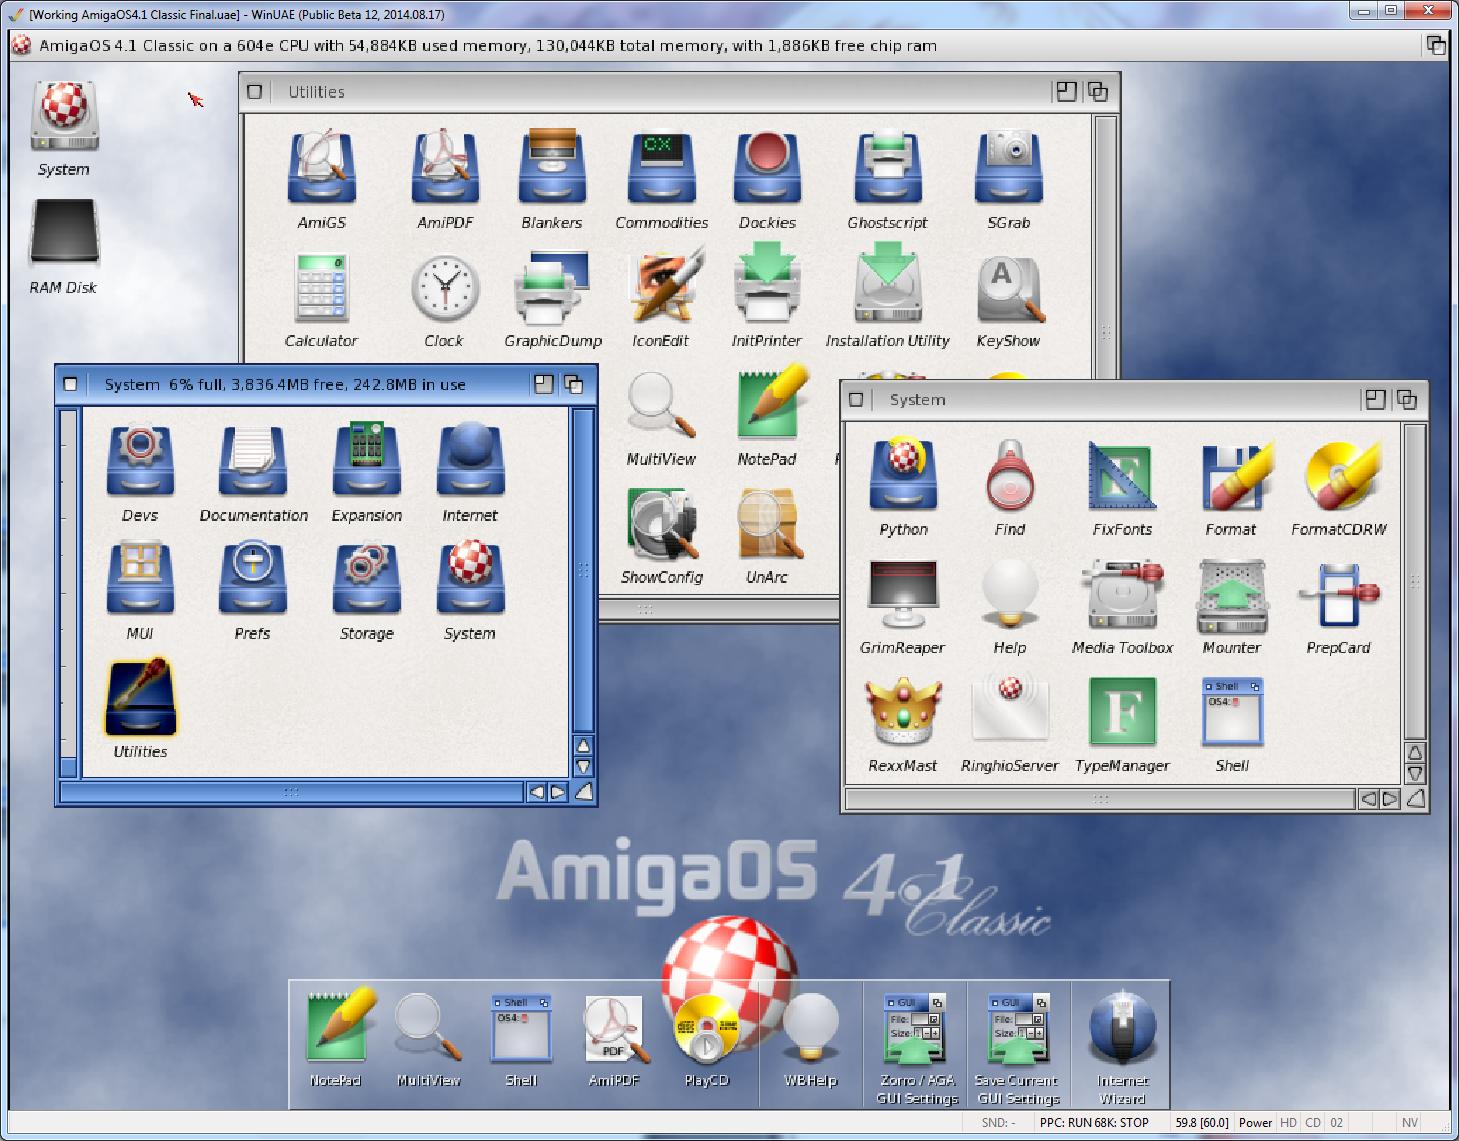 Amiga Podcast: AMIcast - Text Interview 5 - Toni Wilen